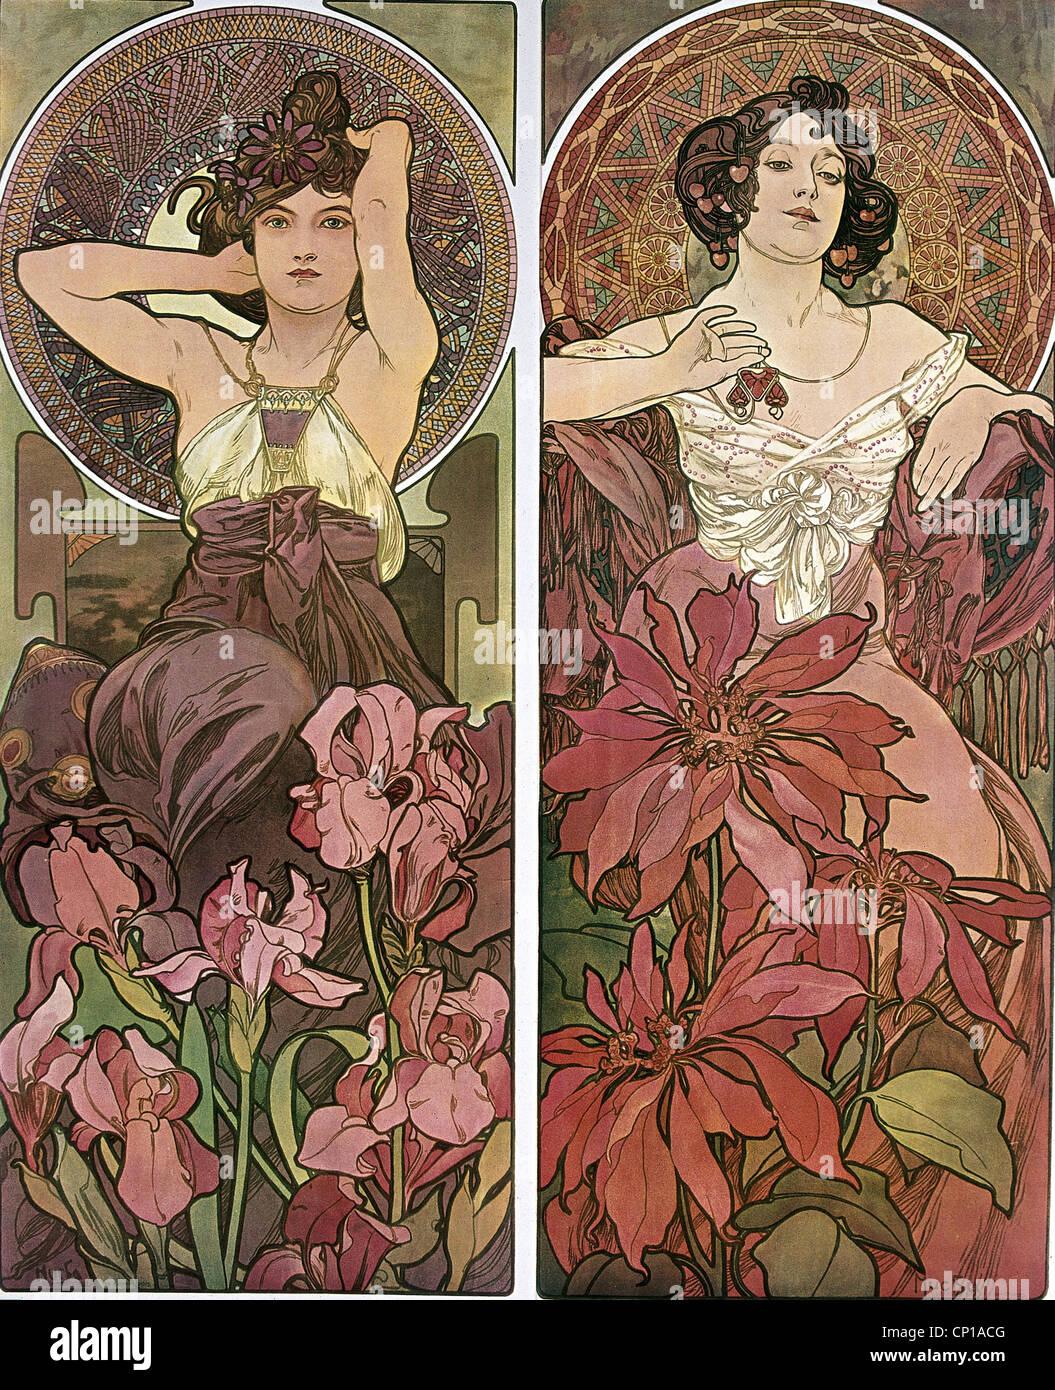 Bildende Kunst, Mucha, Alfons (1860-1939), Plakat, um 1900, zwei Frauen, sitzen, Blumen, Haar, Jugendstil, Alphonse, Stockbild